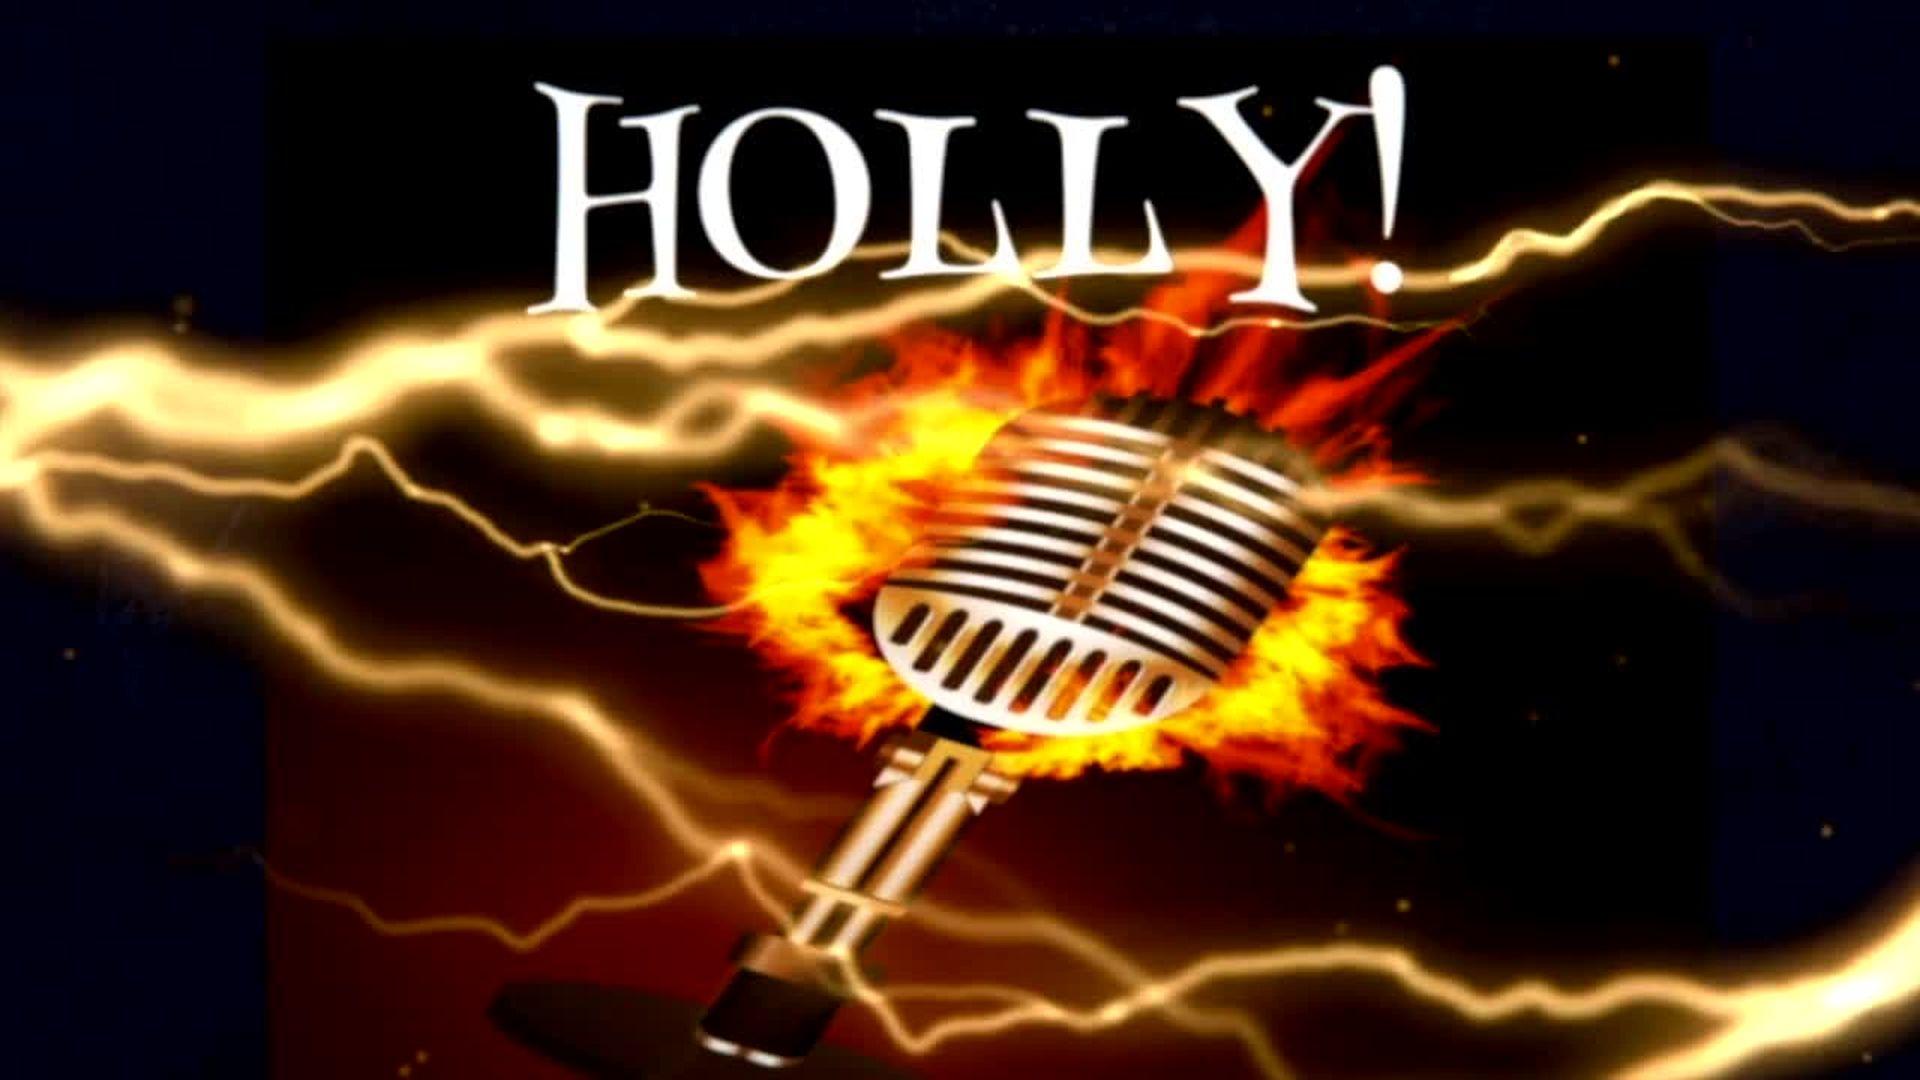 LMAO - HOLLY! - with Linda Marcus Smith